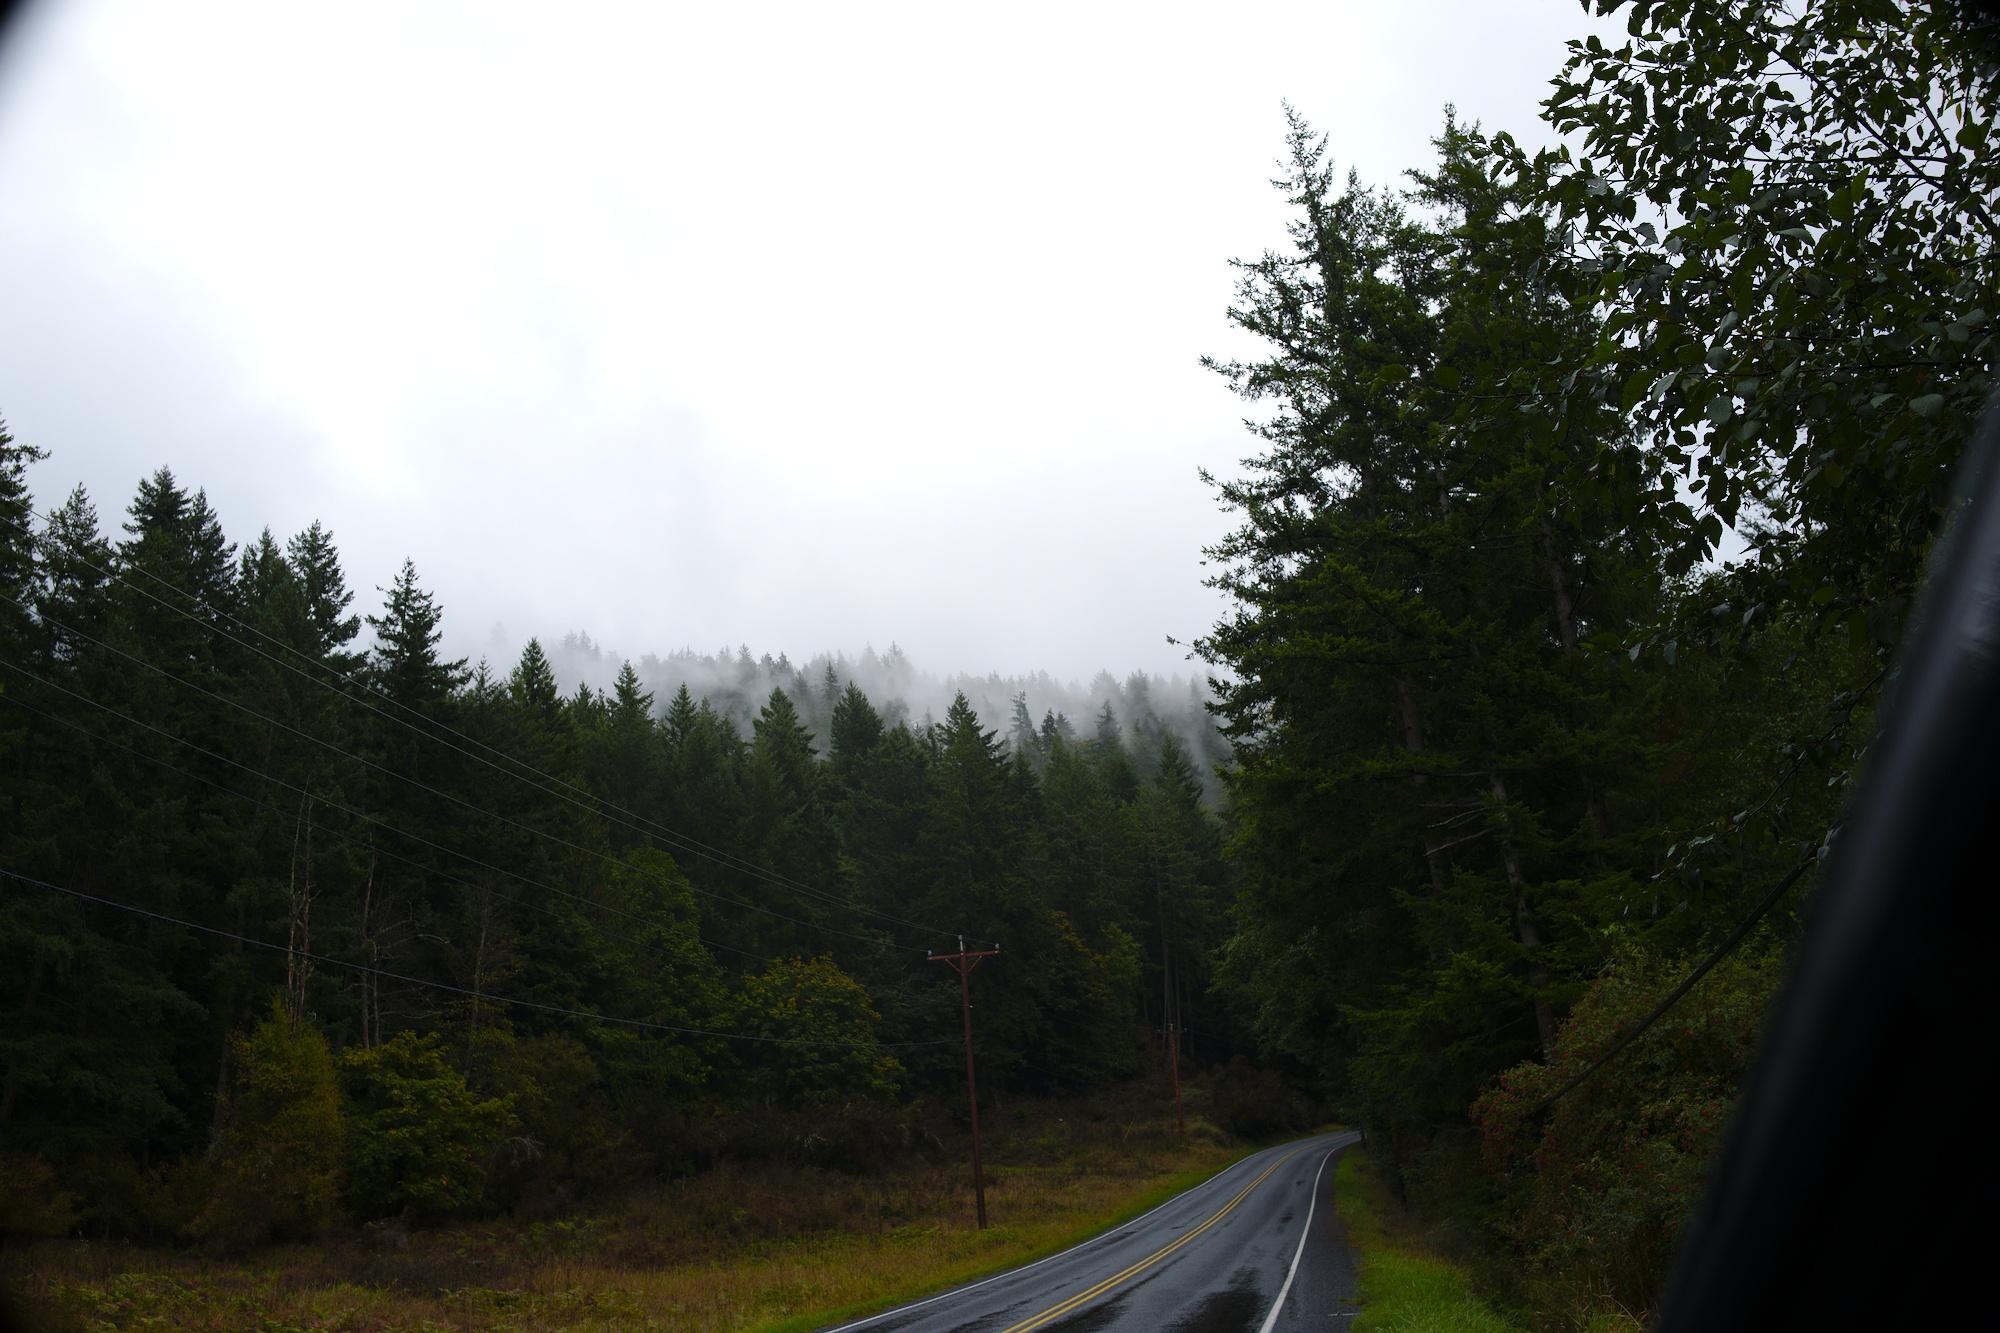 Orcas Island, WA, on the road, trees